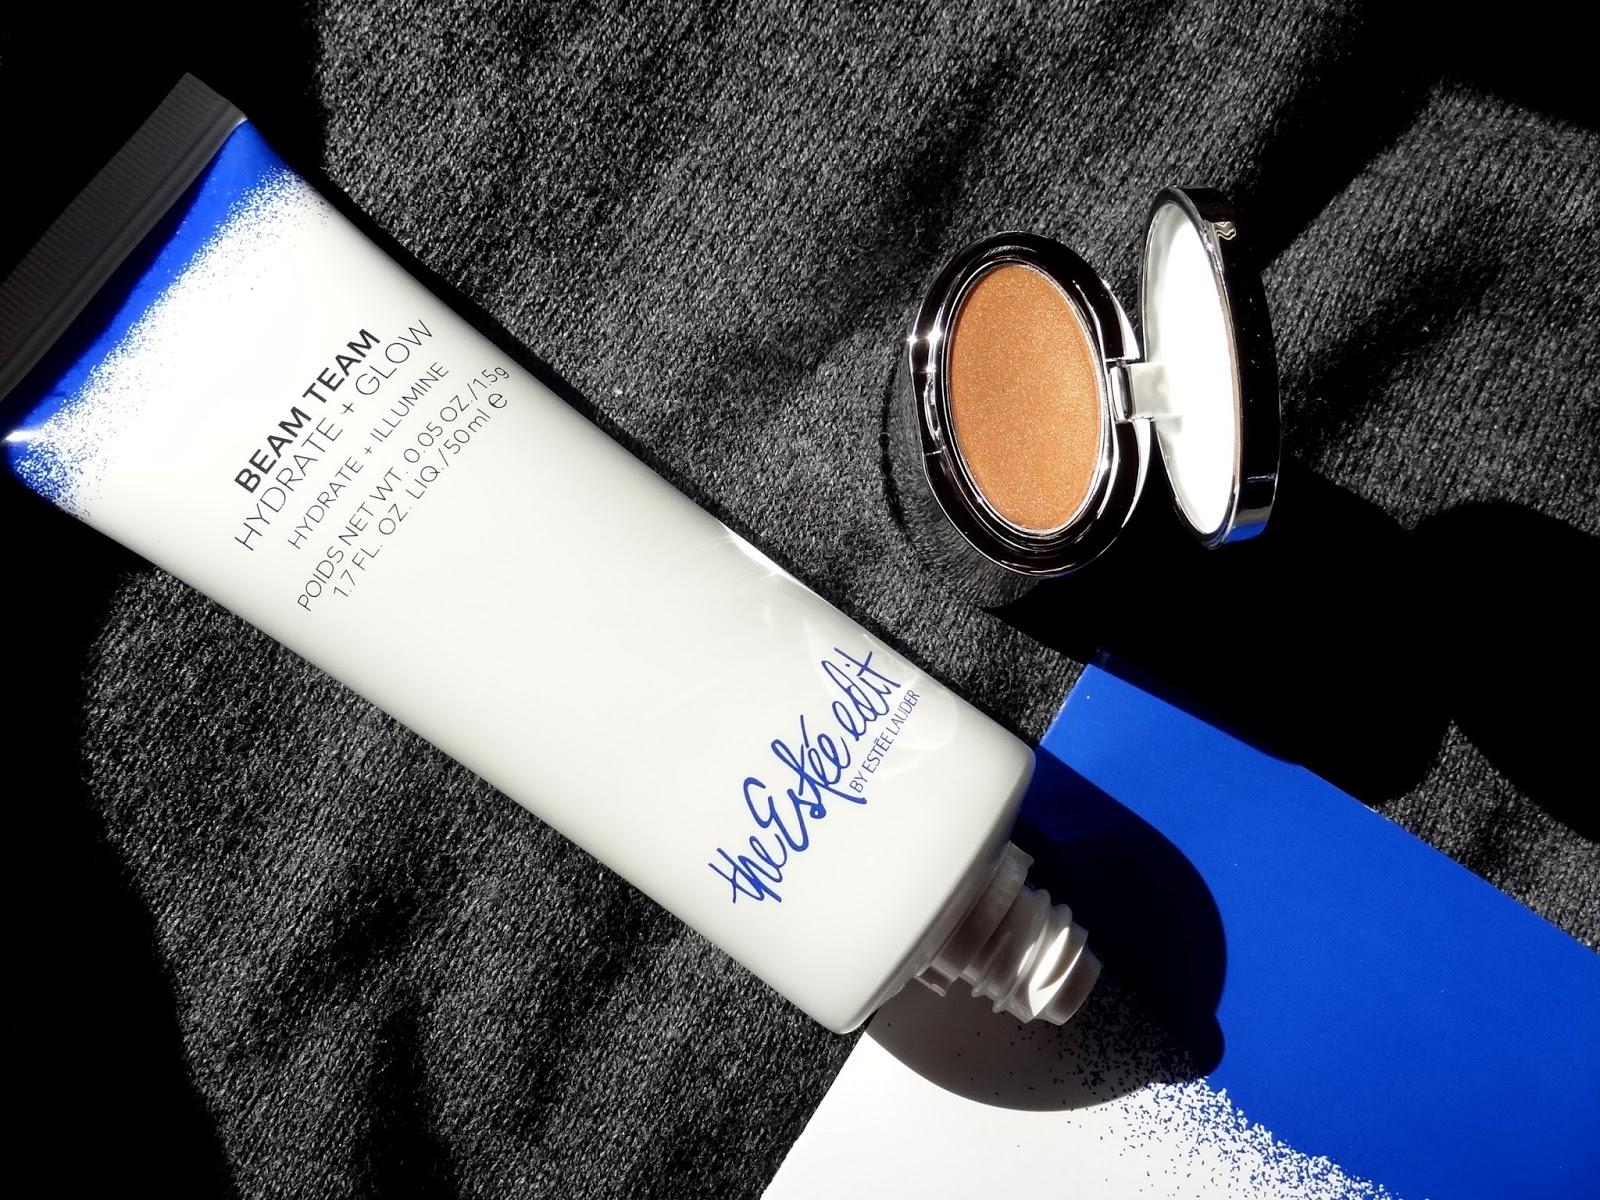 Glow Skin Naturally Tips